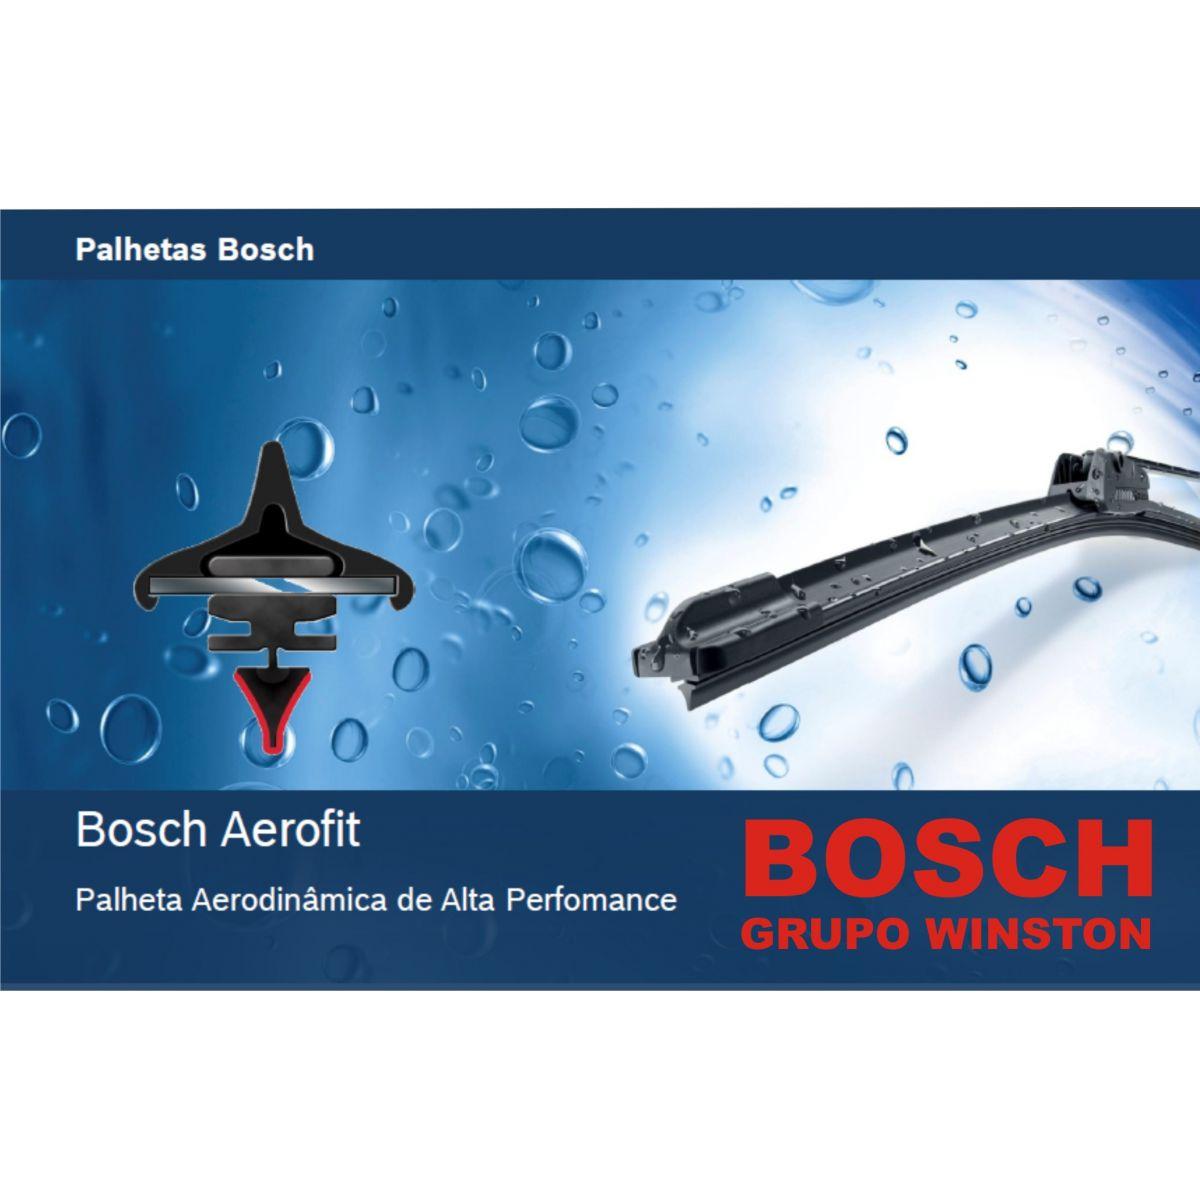 Palheta Bosch Aerofit Limpador de para brisa Bosch NISSAN Quest